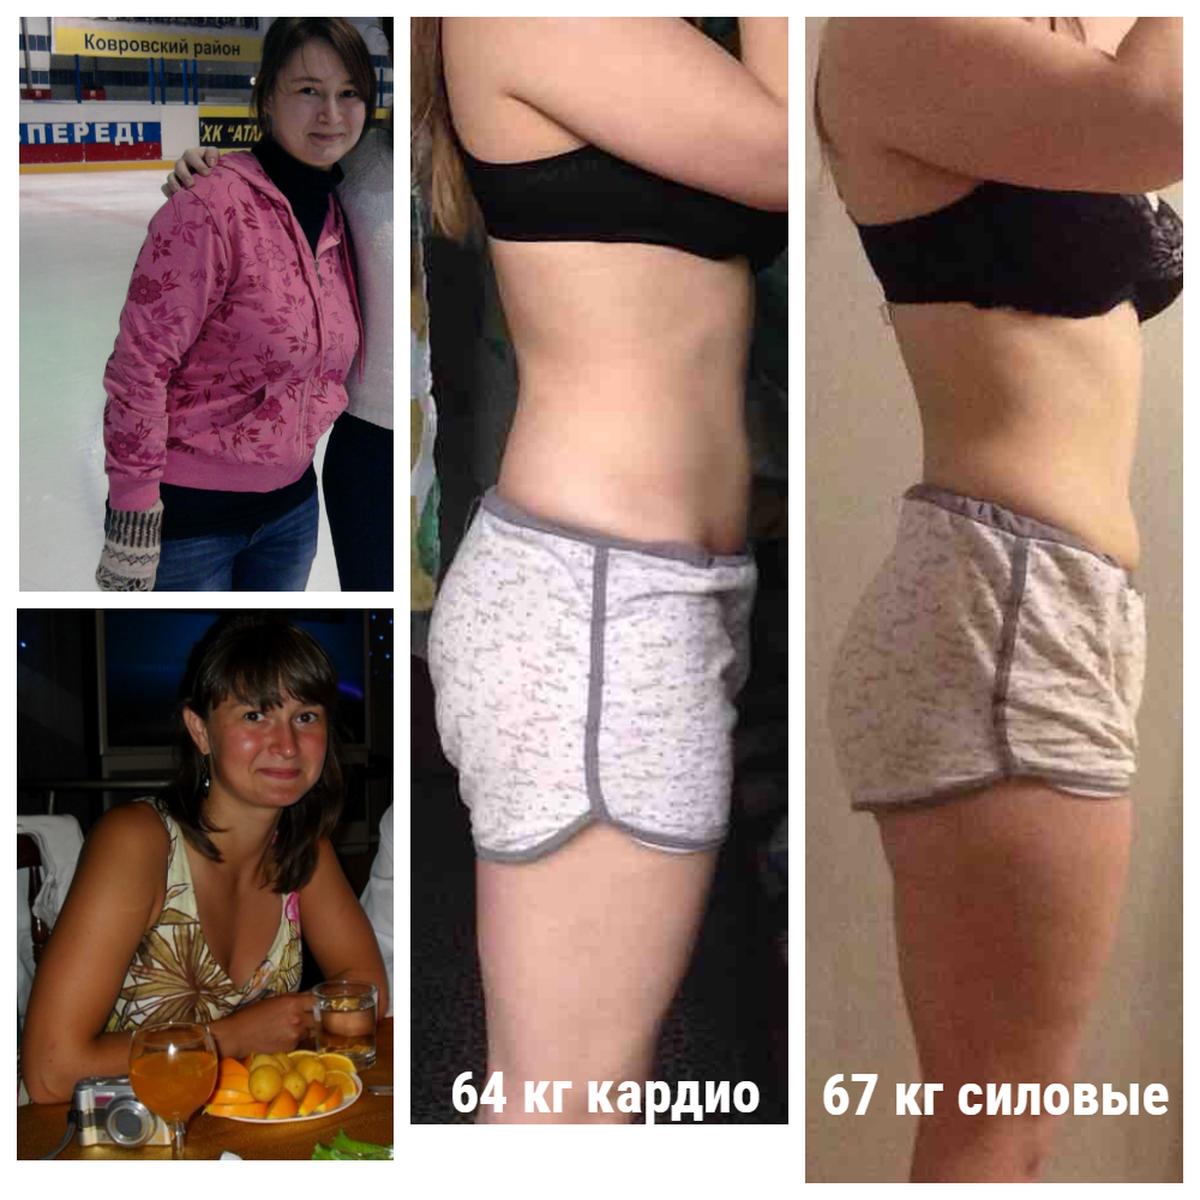 как похудеть за 3 месяца